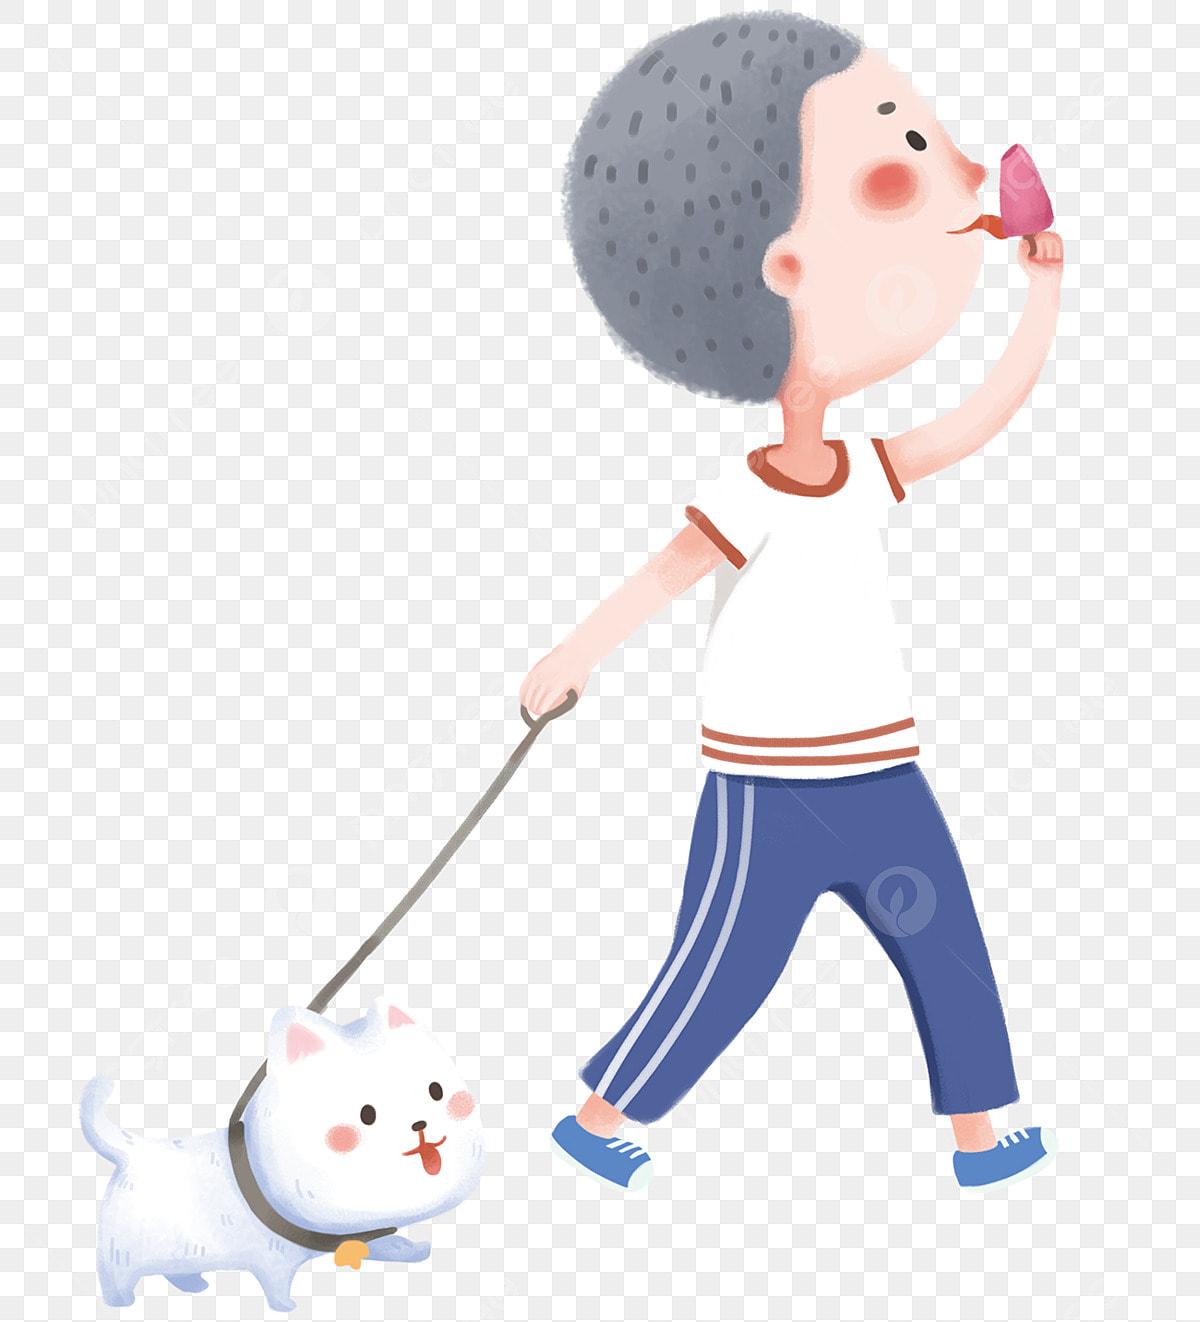 770 Koleksi Gambar Kaki Anjing Kartun HD